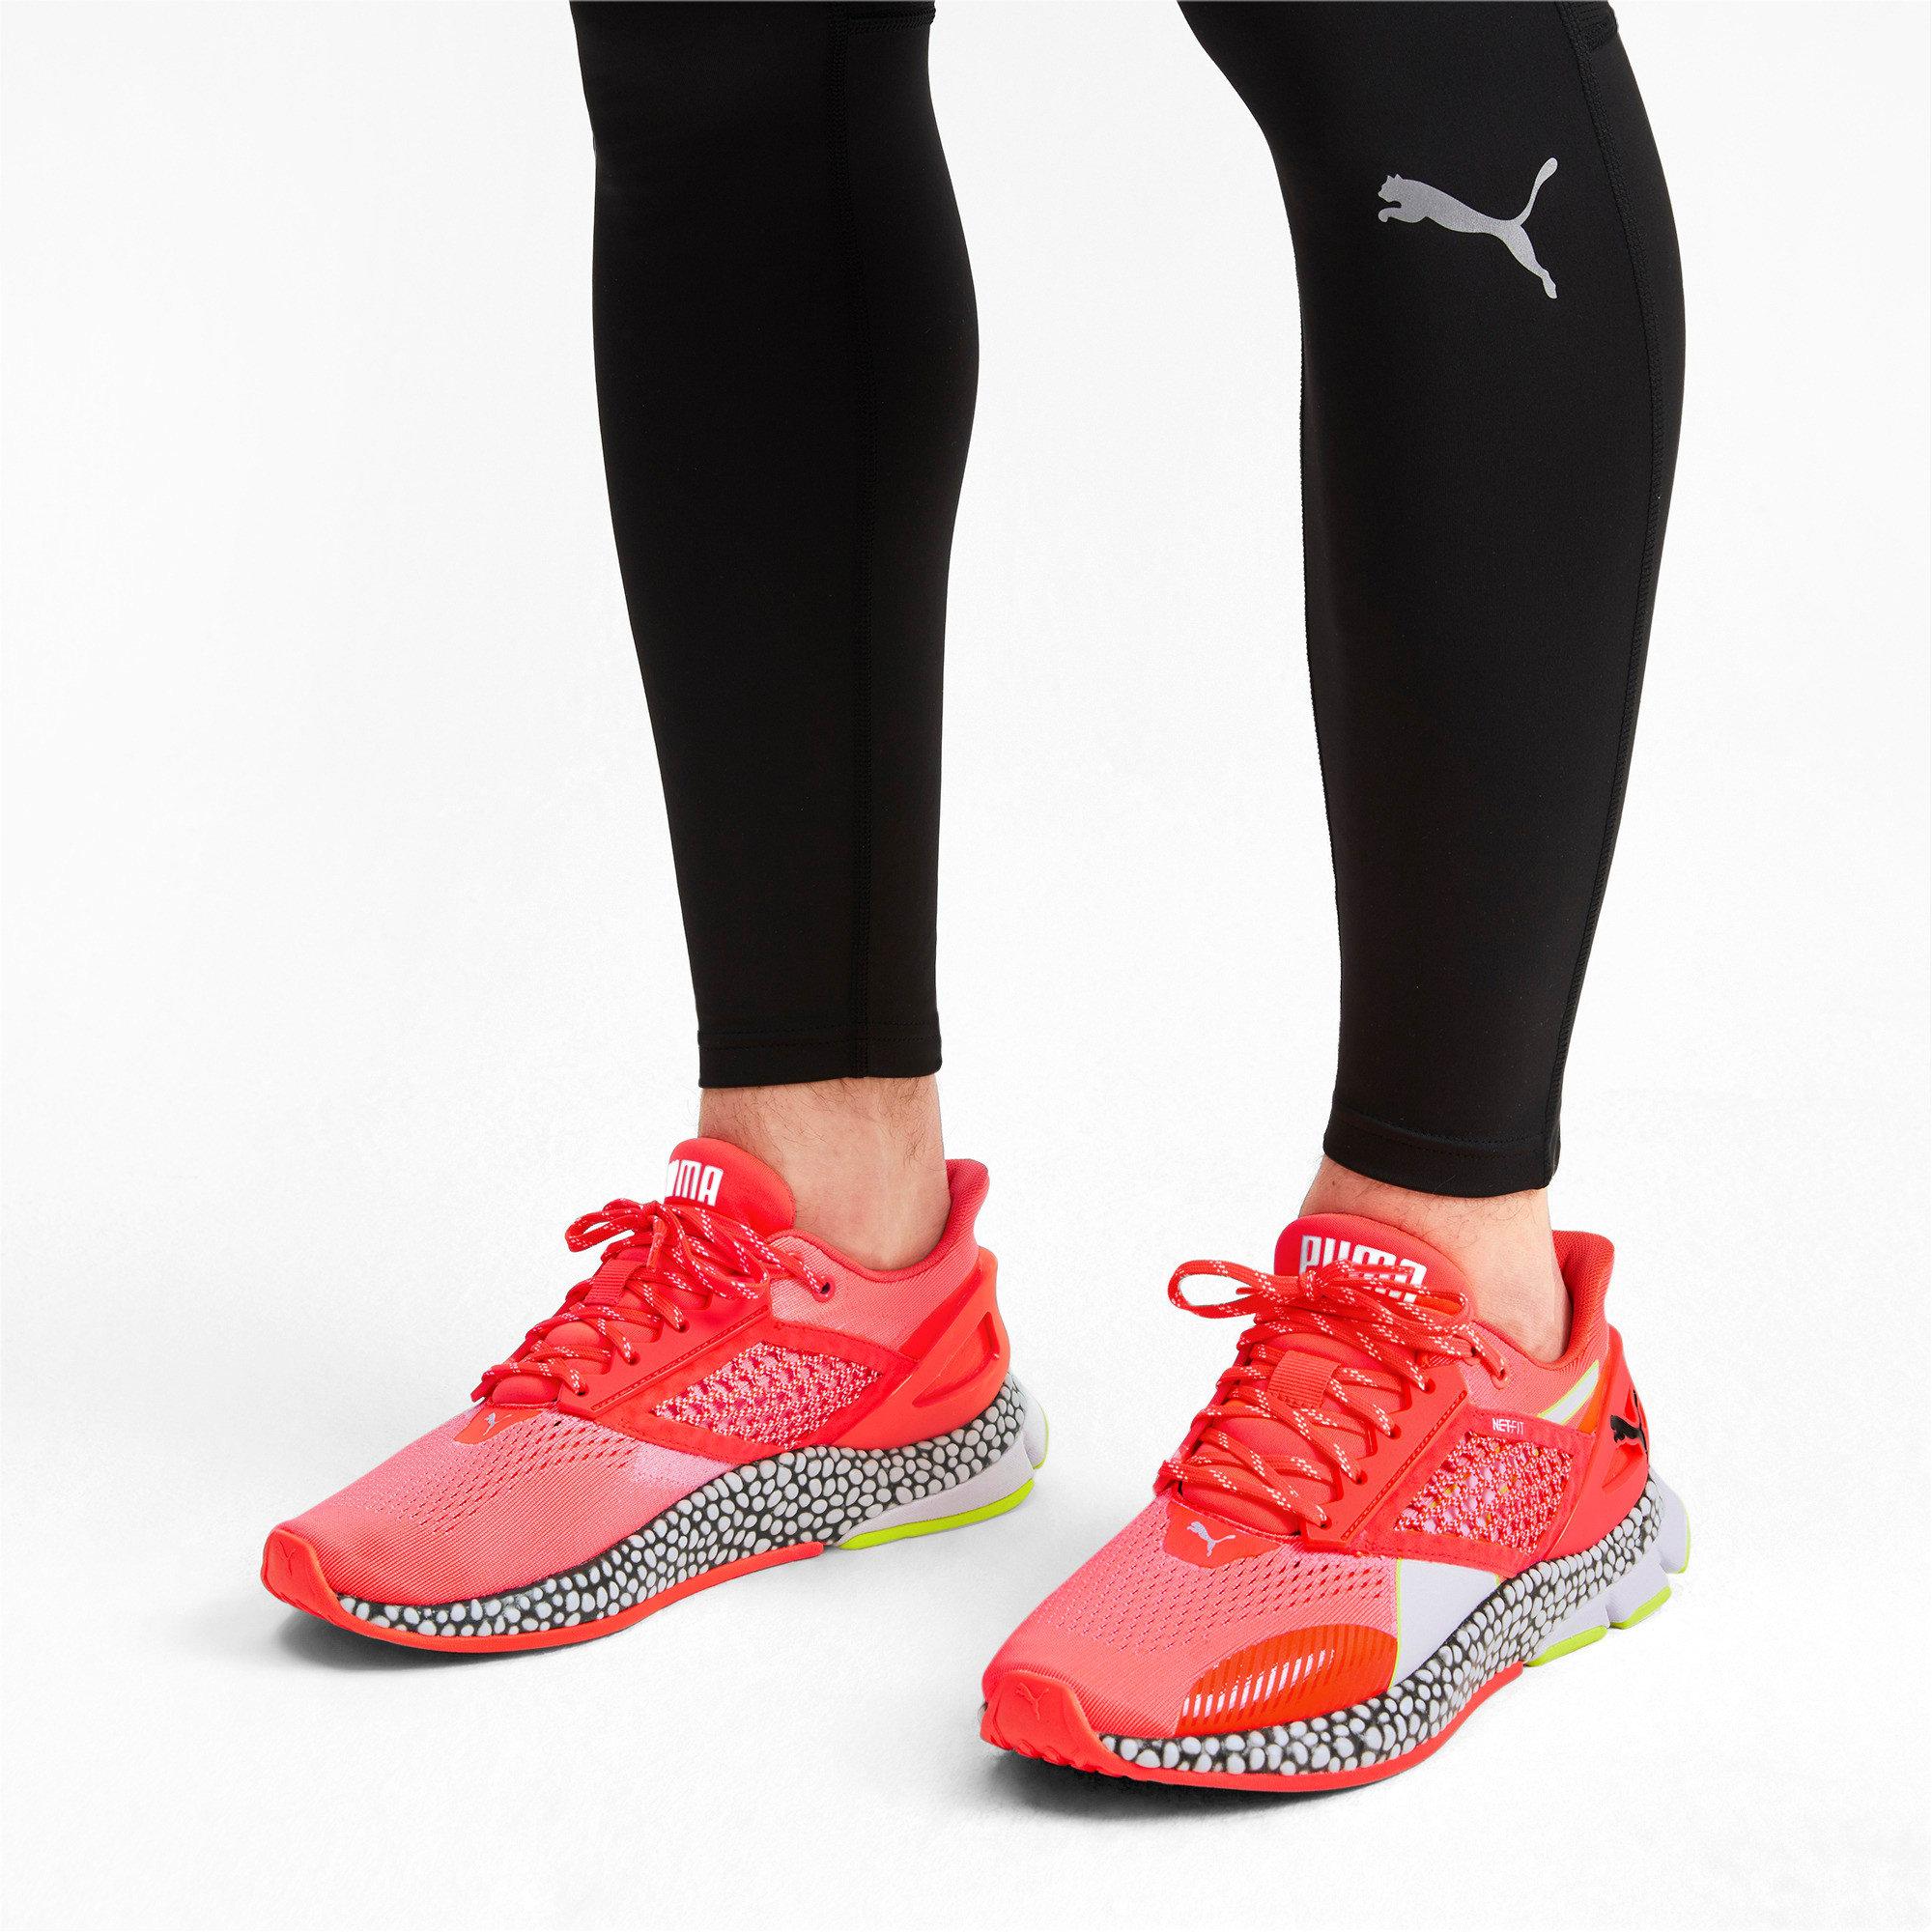 Thumbnail 3 of HYBRID Astro Men's Running Shoes, Nrgy Red-Puma Black, medium